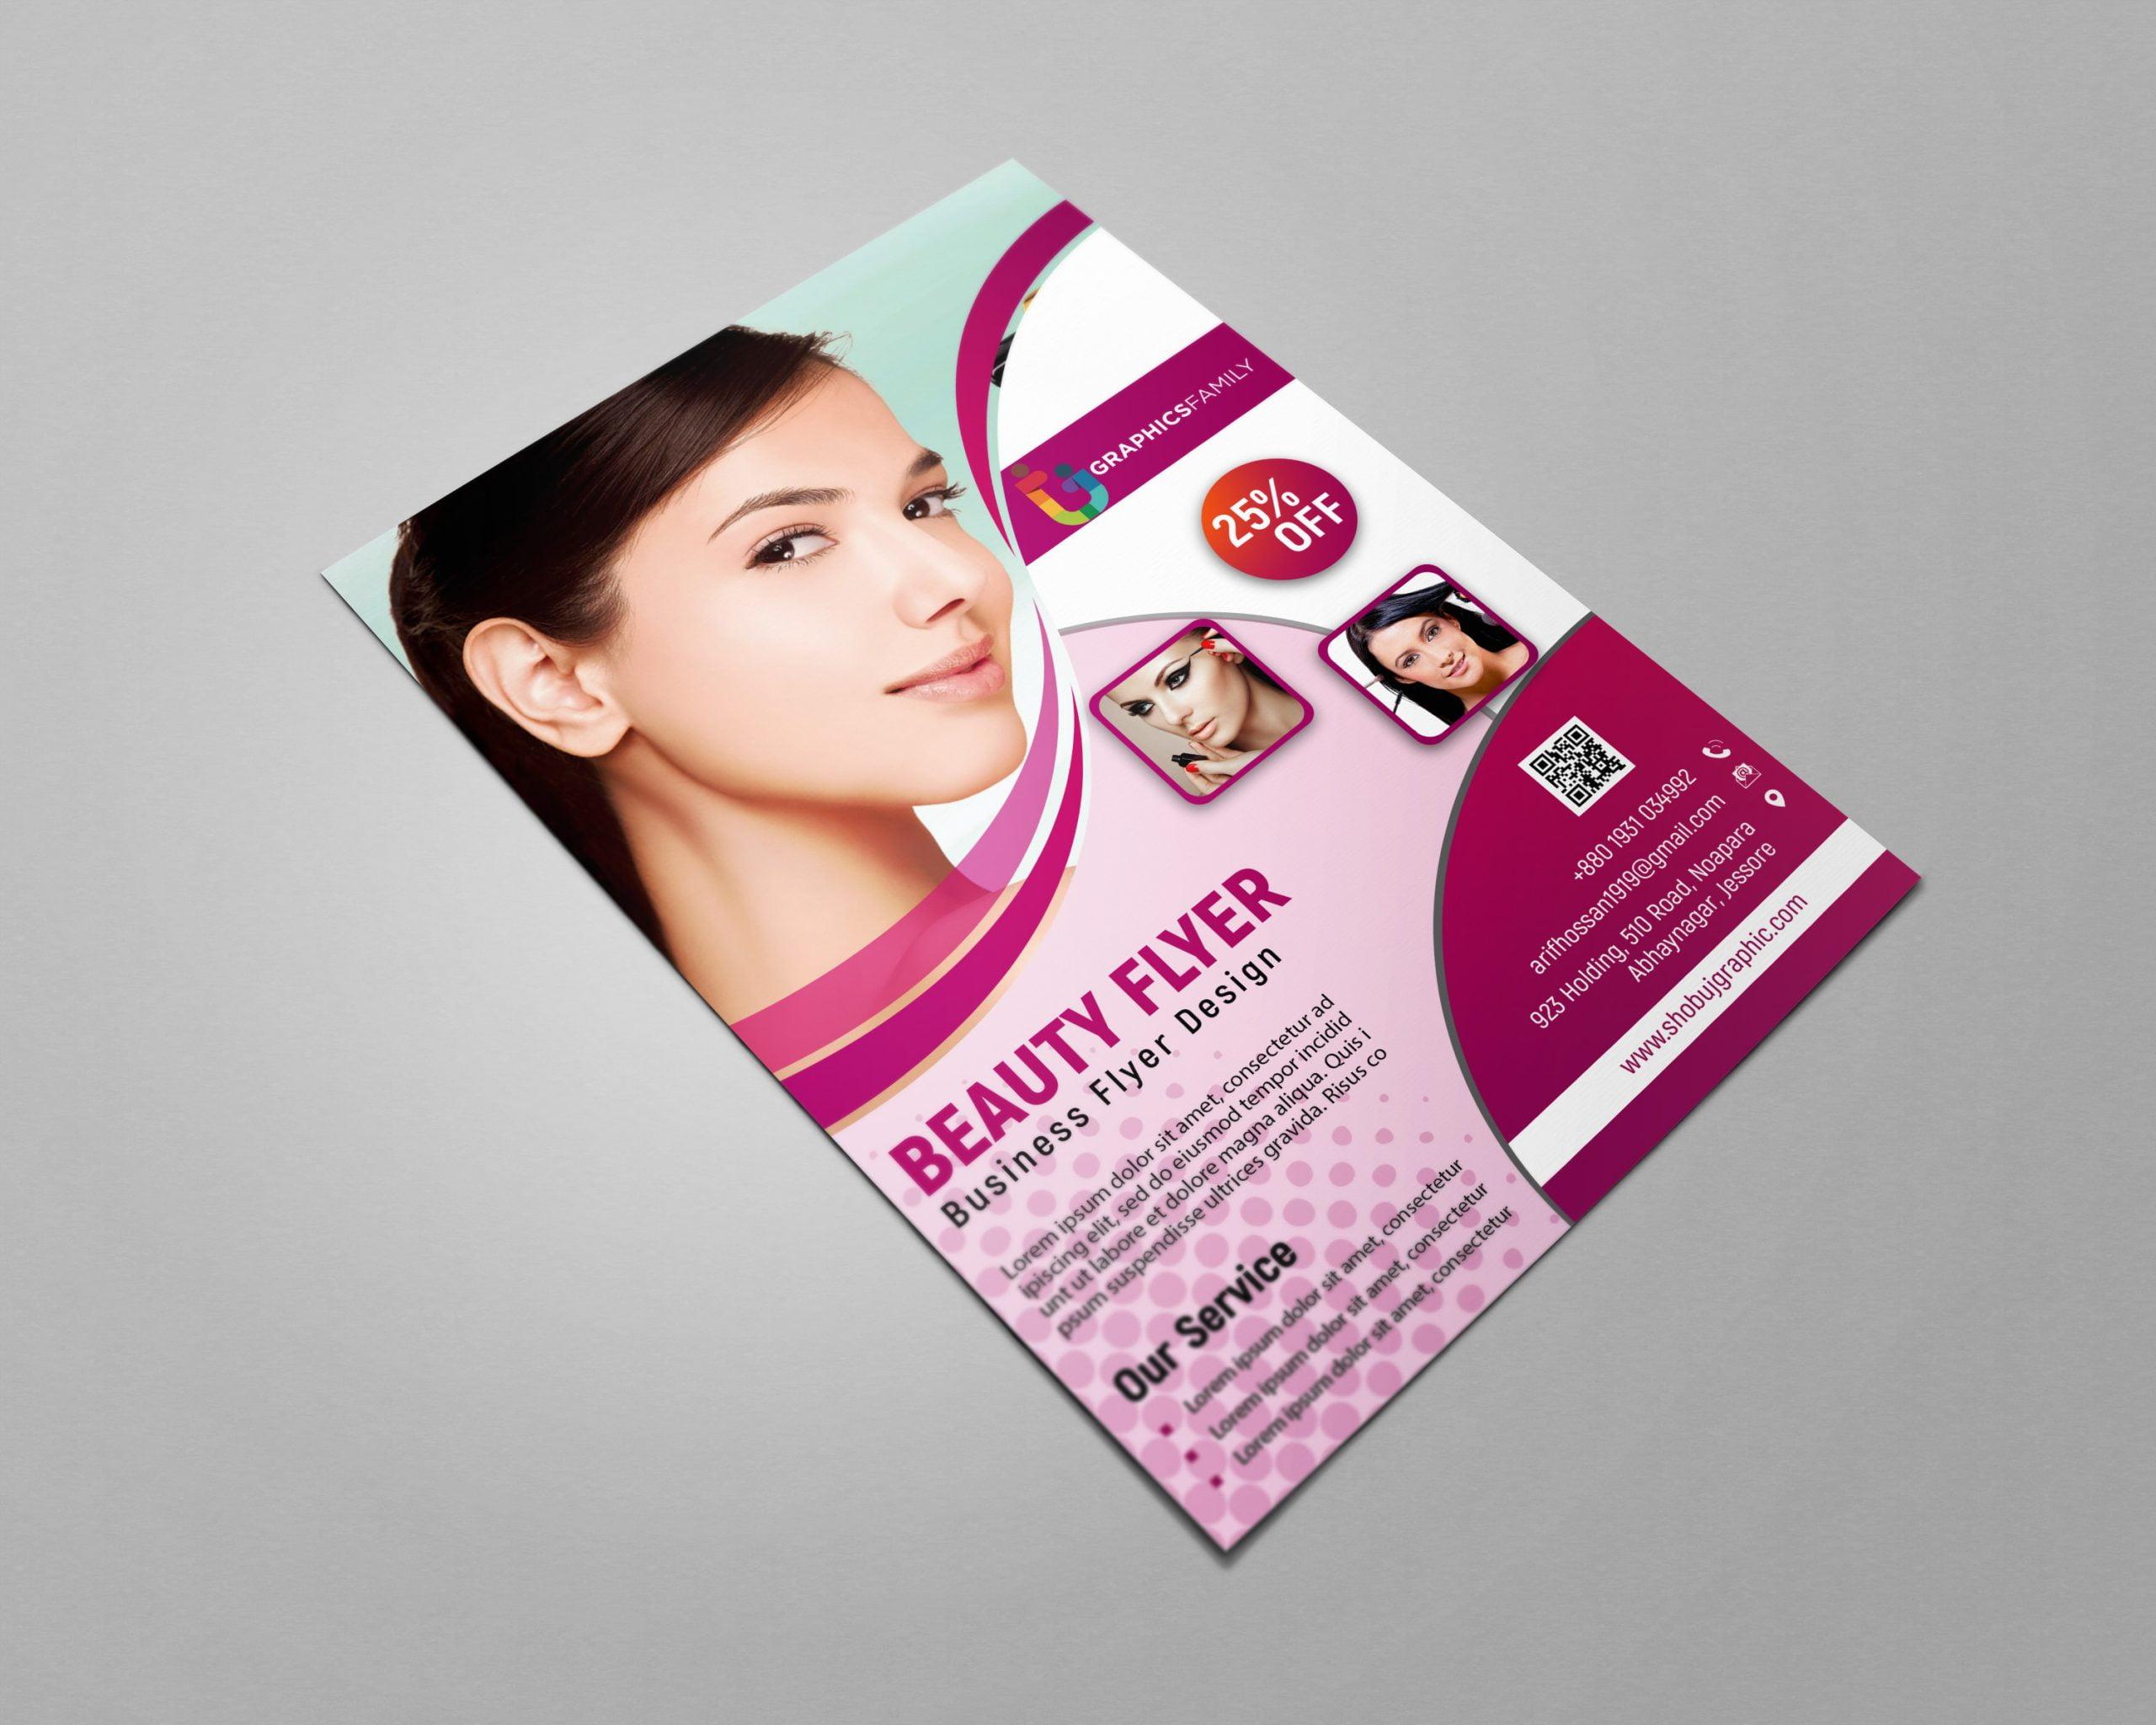 Free Beauty Flyer Photoshop Template presentation